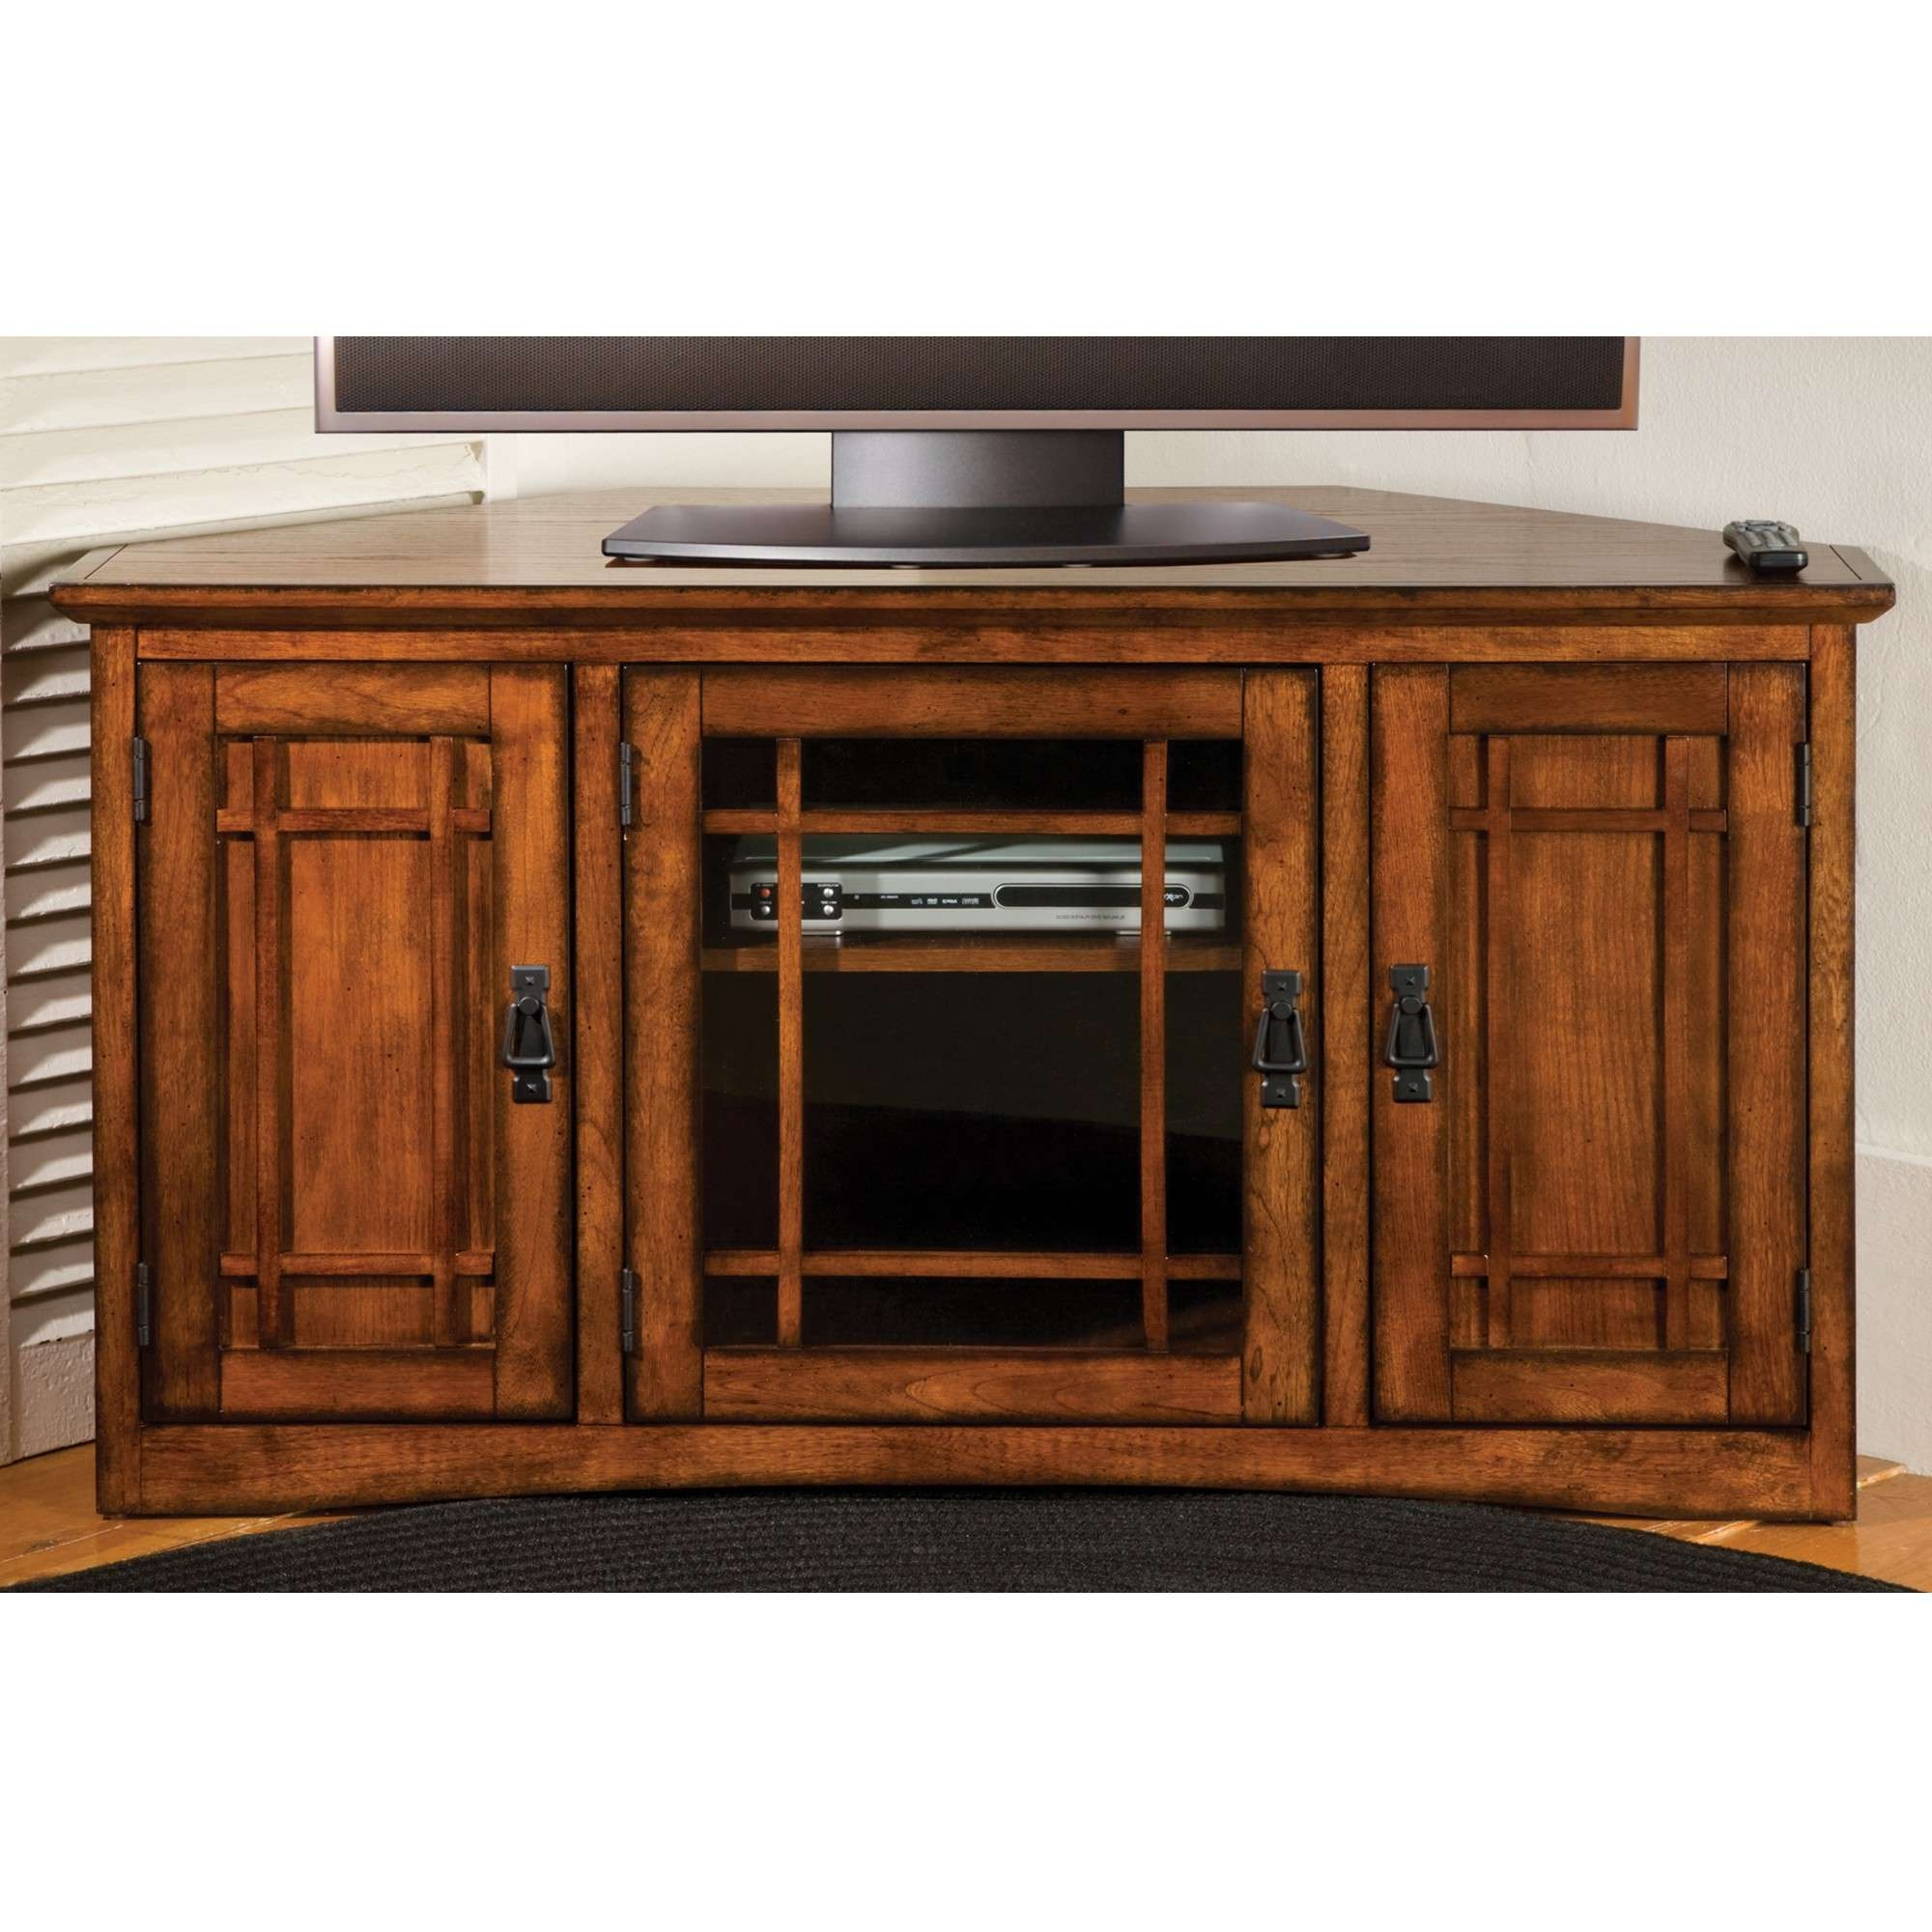 Low Corner Tv Stand 55 Inch Flat Screencorner Flat Screen Tv Regarding Low Corner Tv Cabinets (View 6 of 20)